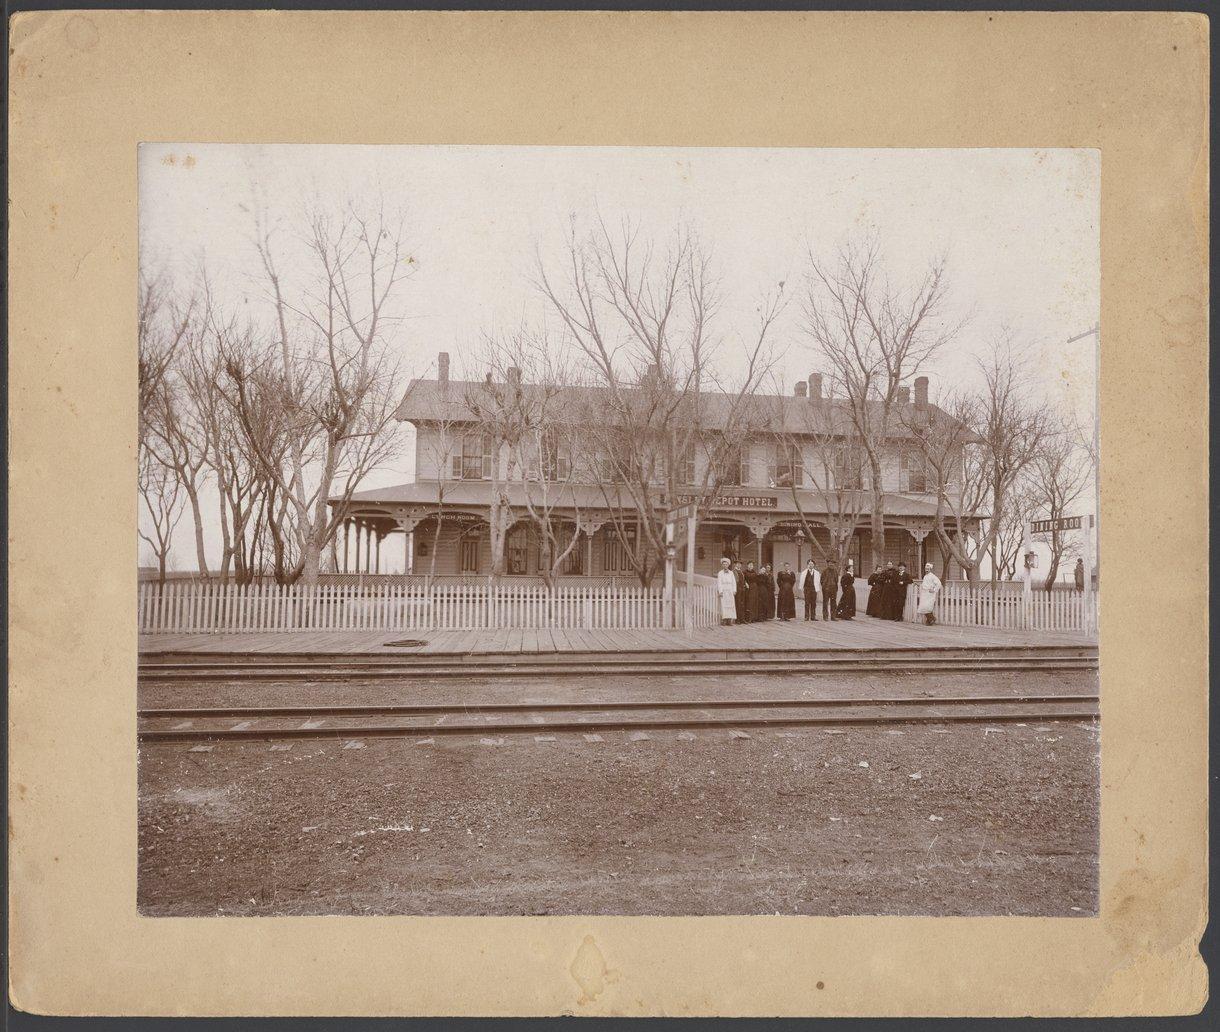 Depot hotel in Kinsley, Kansas